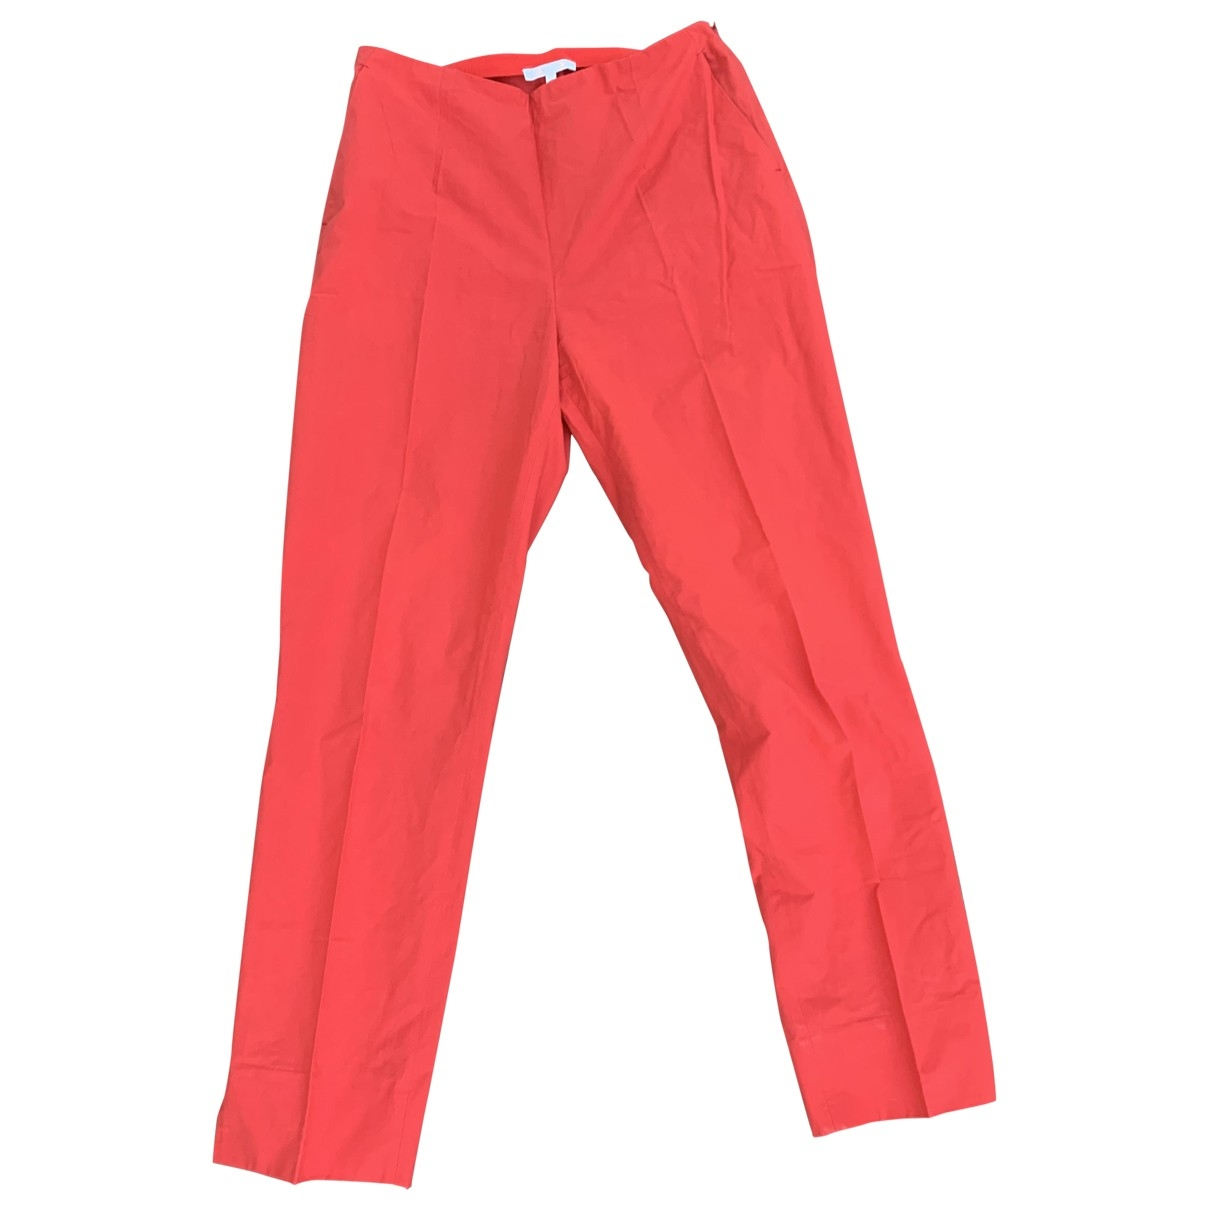 Paule Ka \N Red Cotton Trousers for Women 38 FR